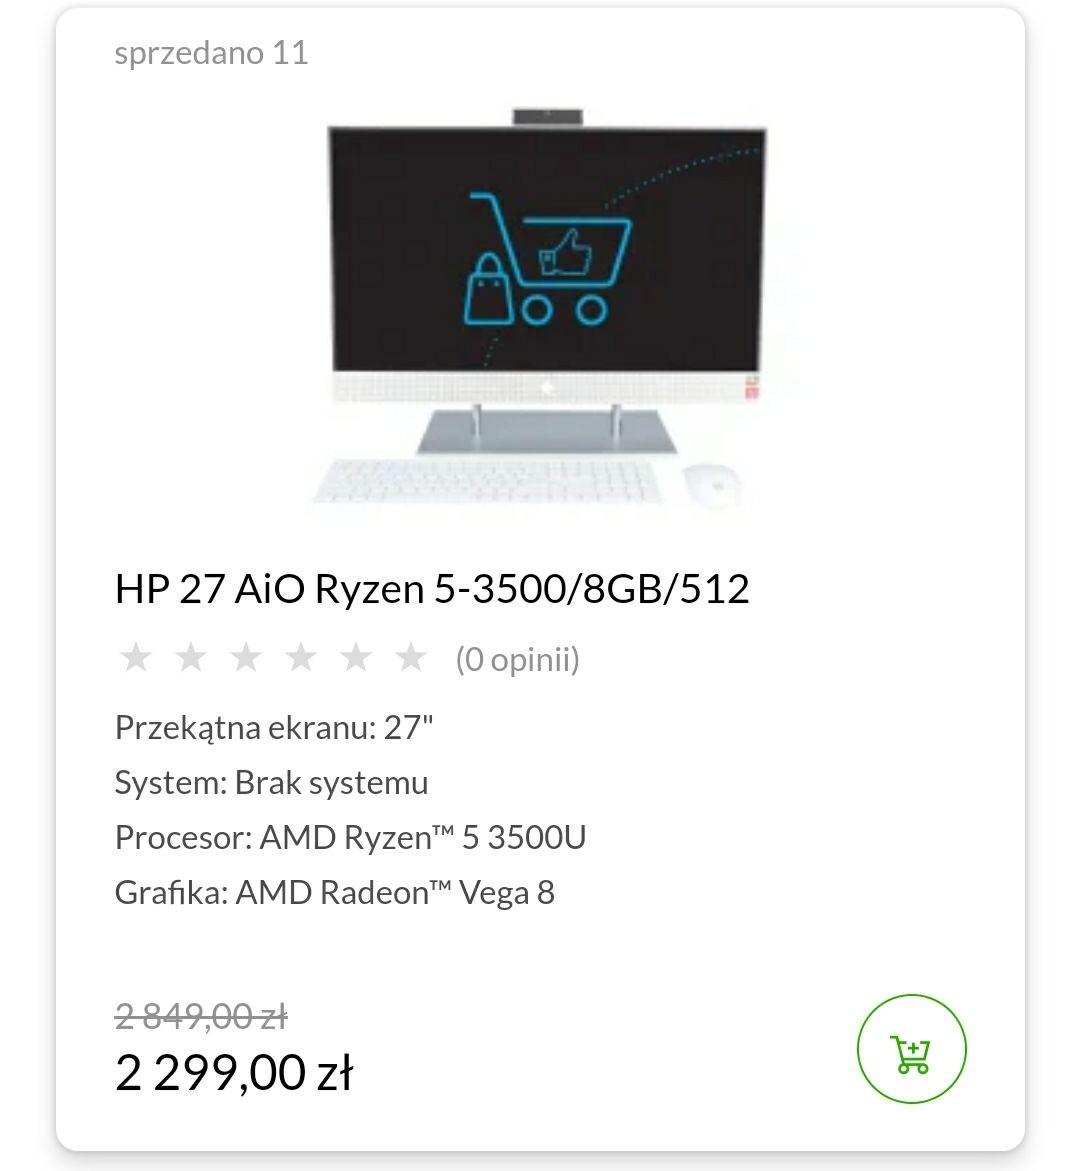 "HP 27 AiO HP Ryzen 5-3500/8GB/512 Przekątna ekranu: 27"" System: Brak systemu Procesor: AMD Ryzen™ 5 3500U Grafika: AMD Radeon™ Vega 8"